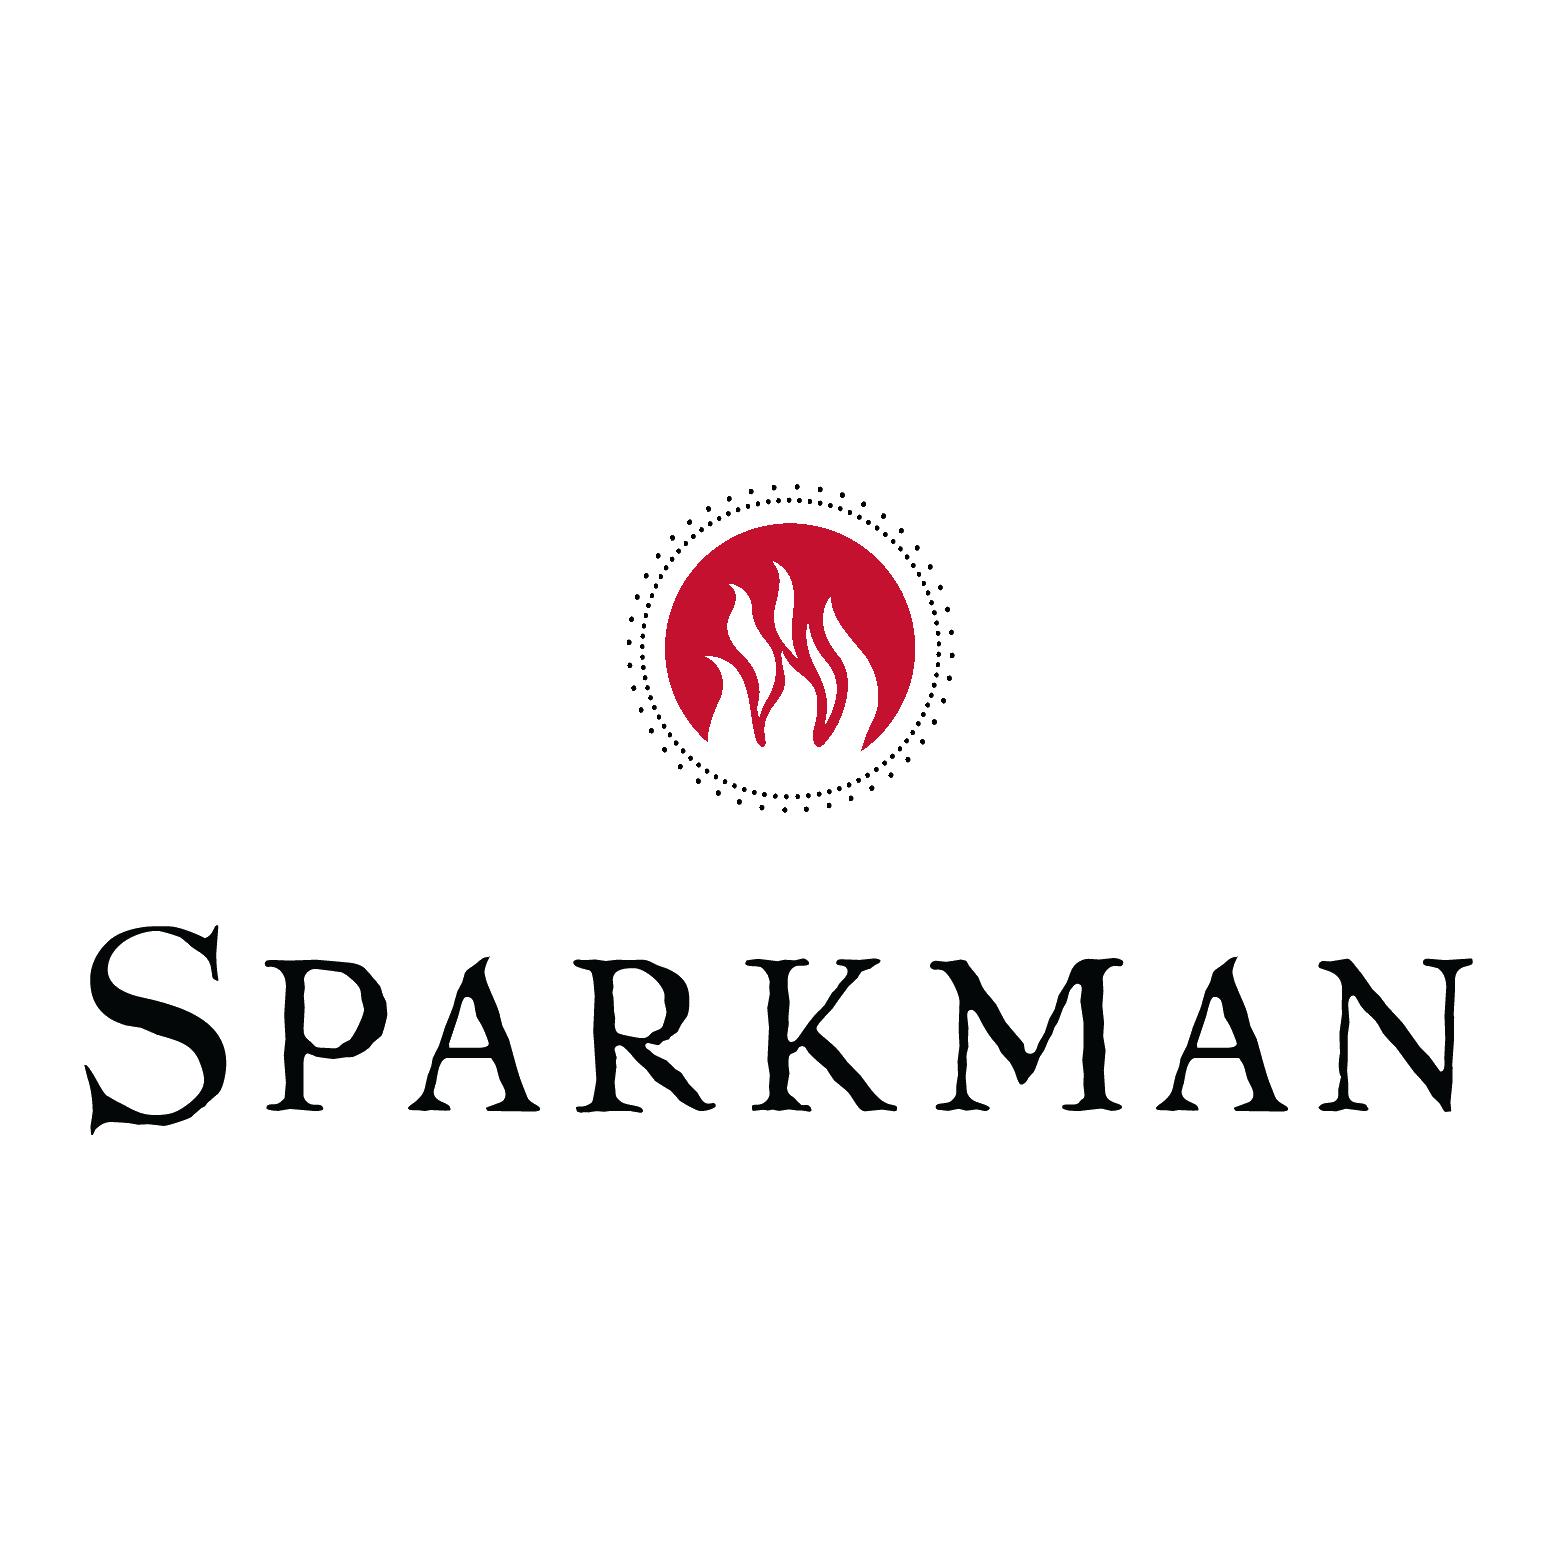 Sparkman